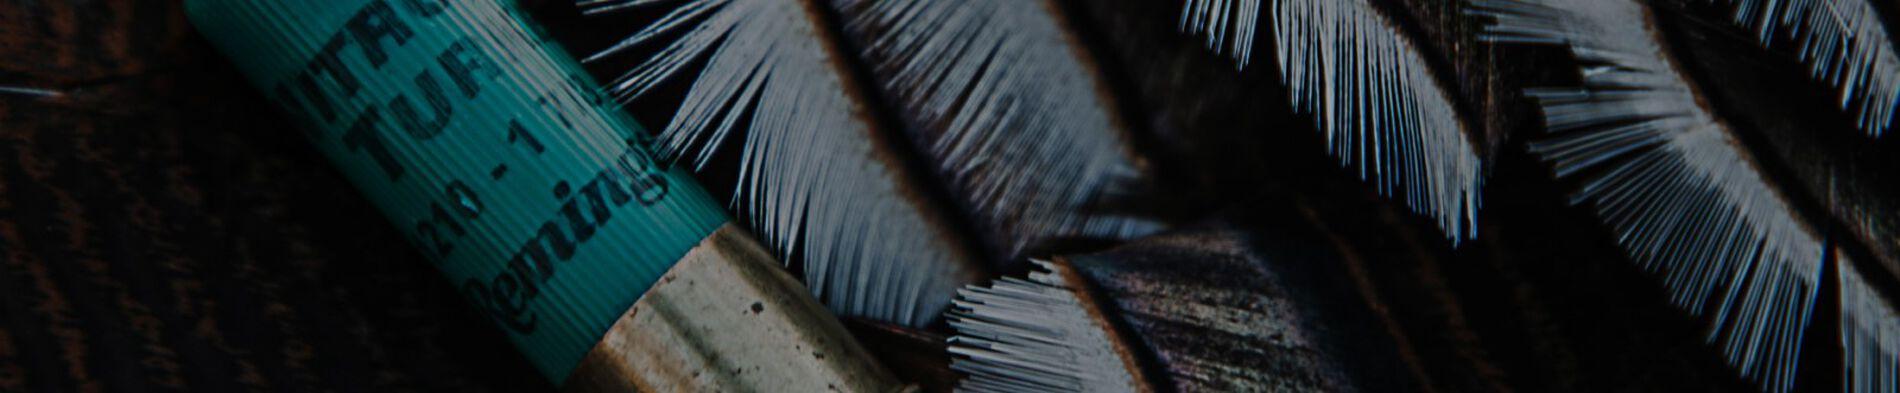 Nitro Turkey Shell with Turkey Feathers